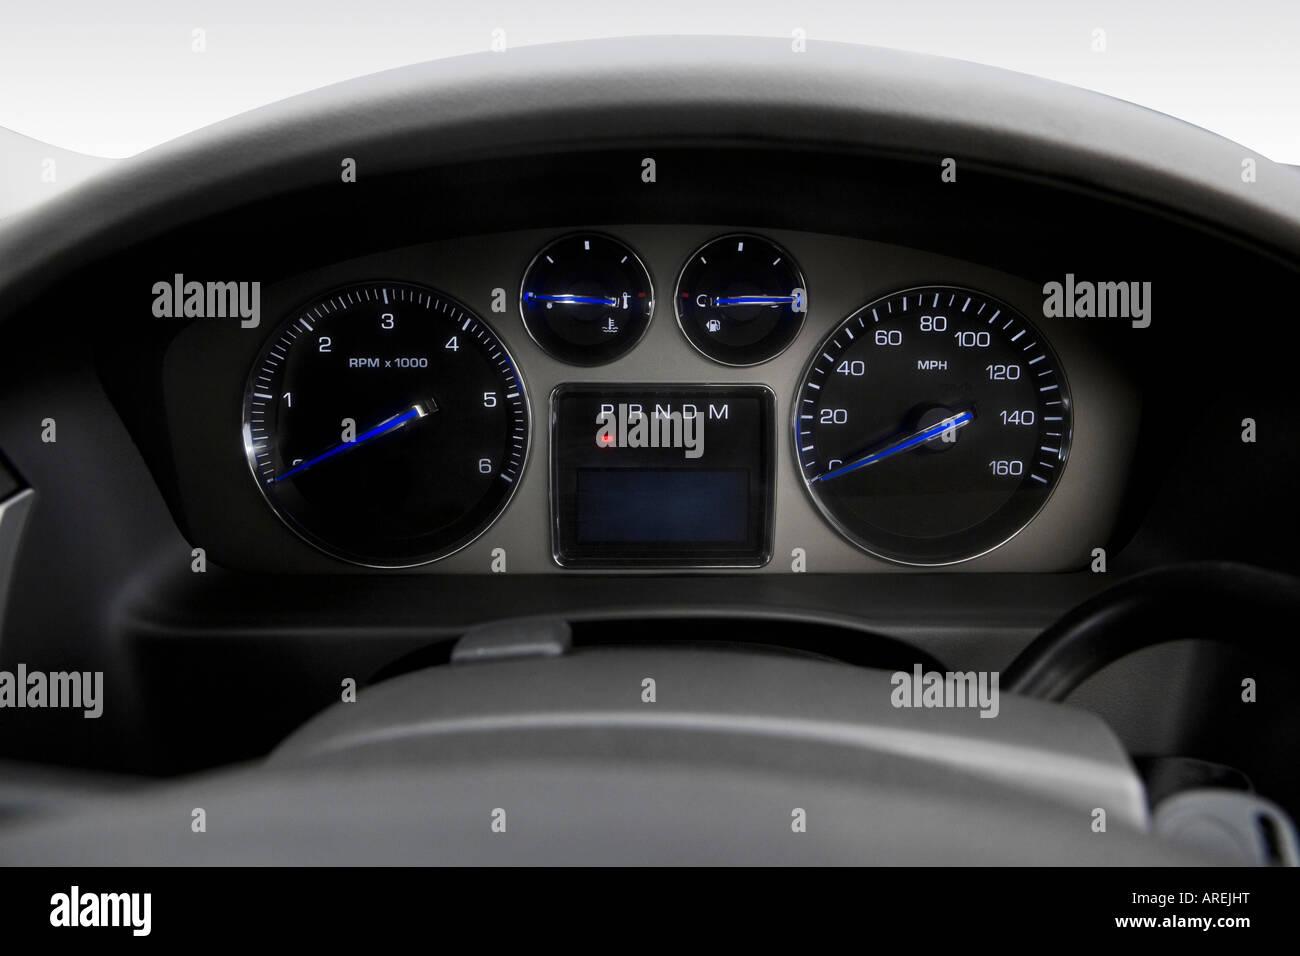 hight resolution of 2007 cadillac escalade esv in black speedometer tachometer stock image